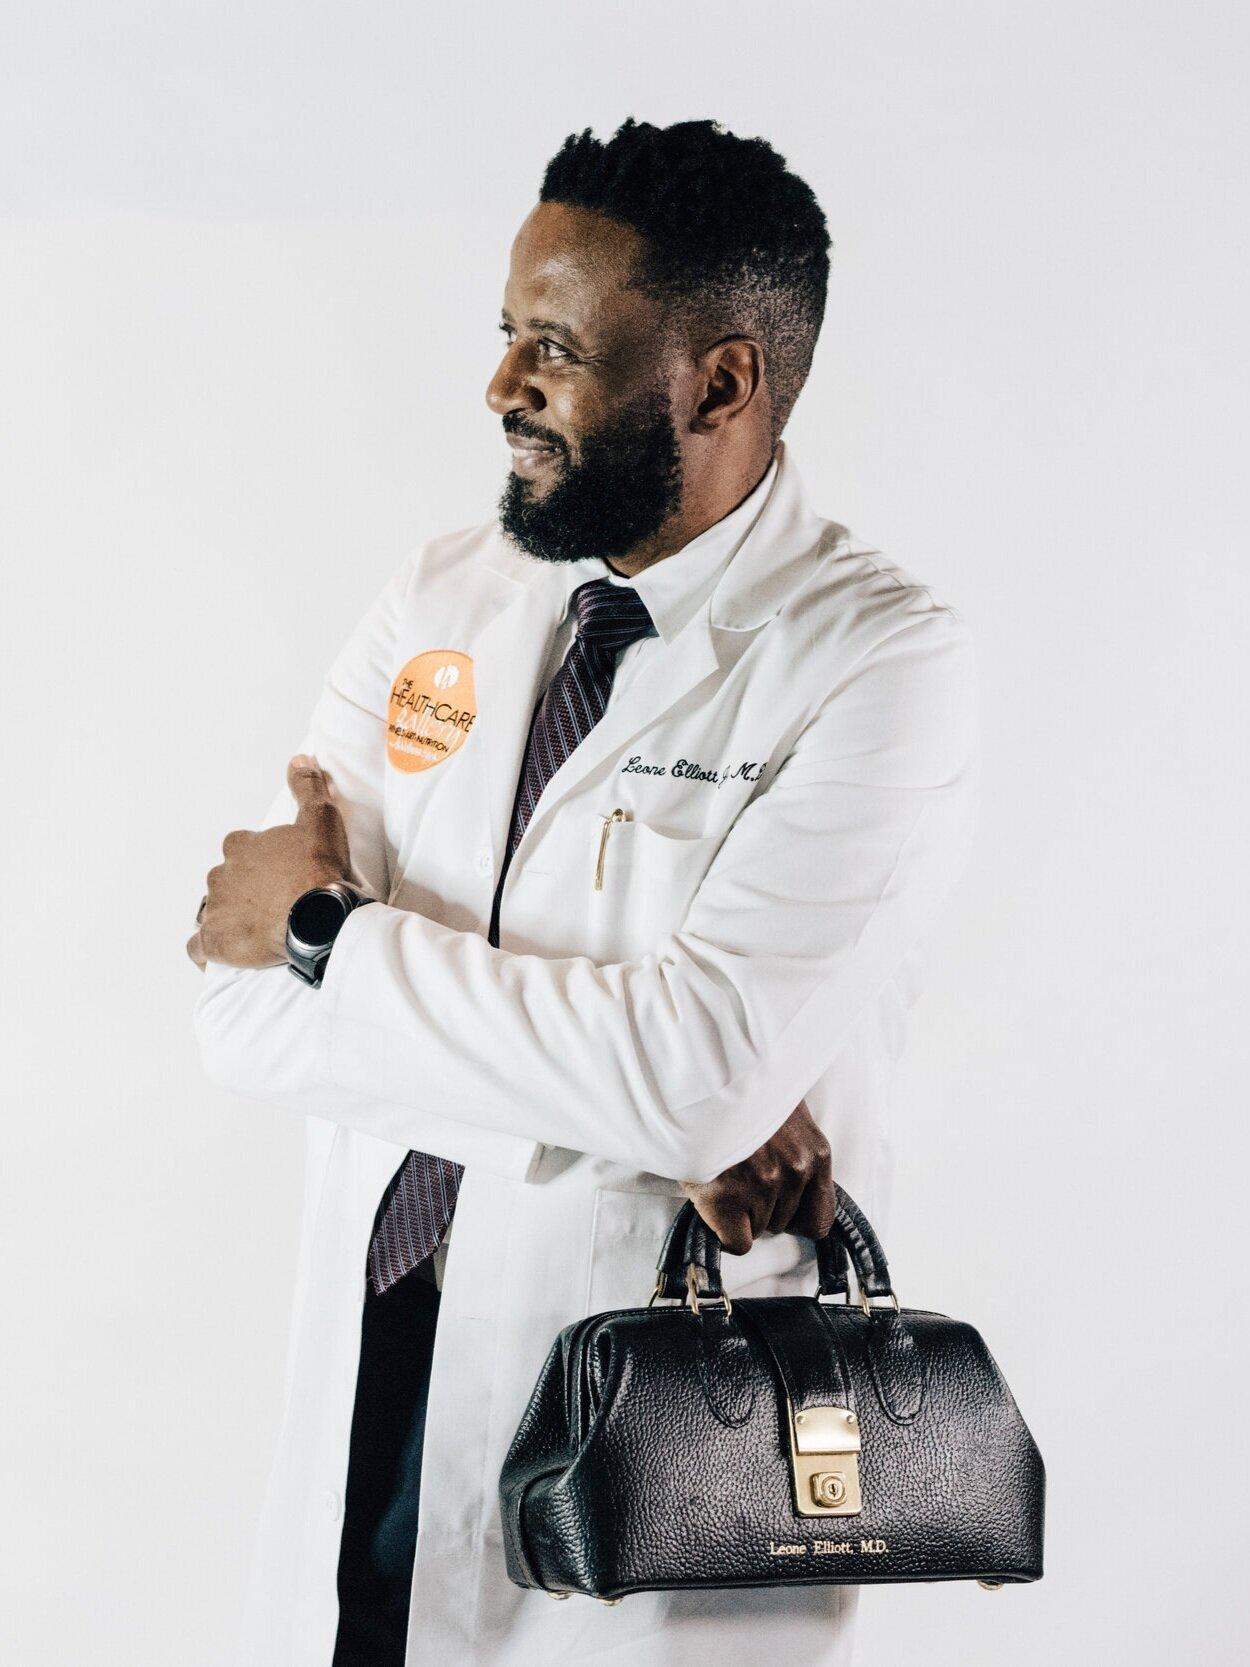 Dr. Leone Elliott